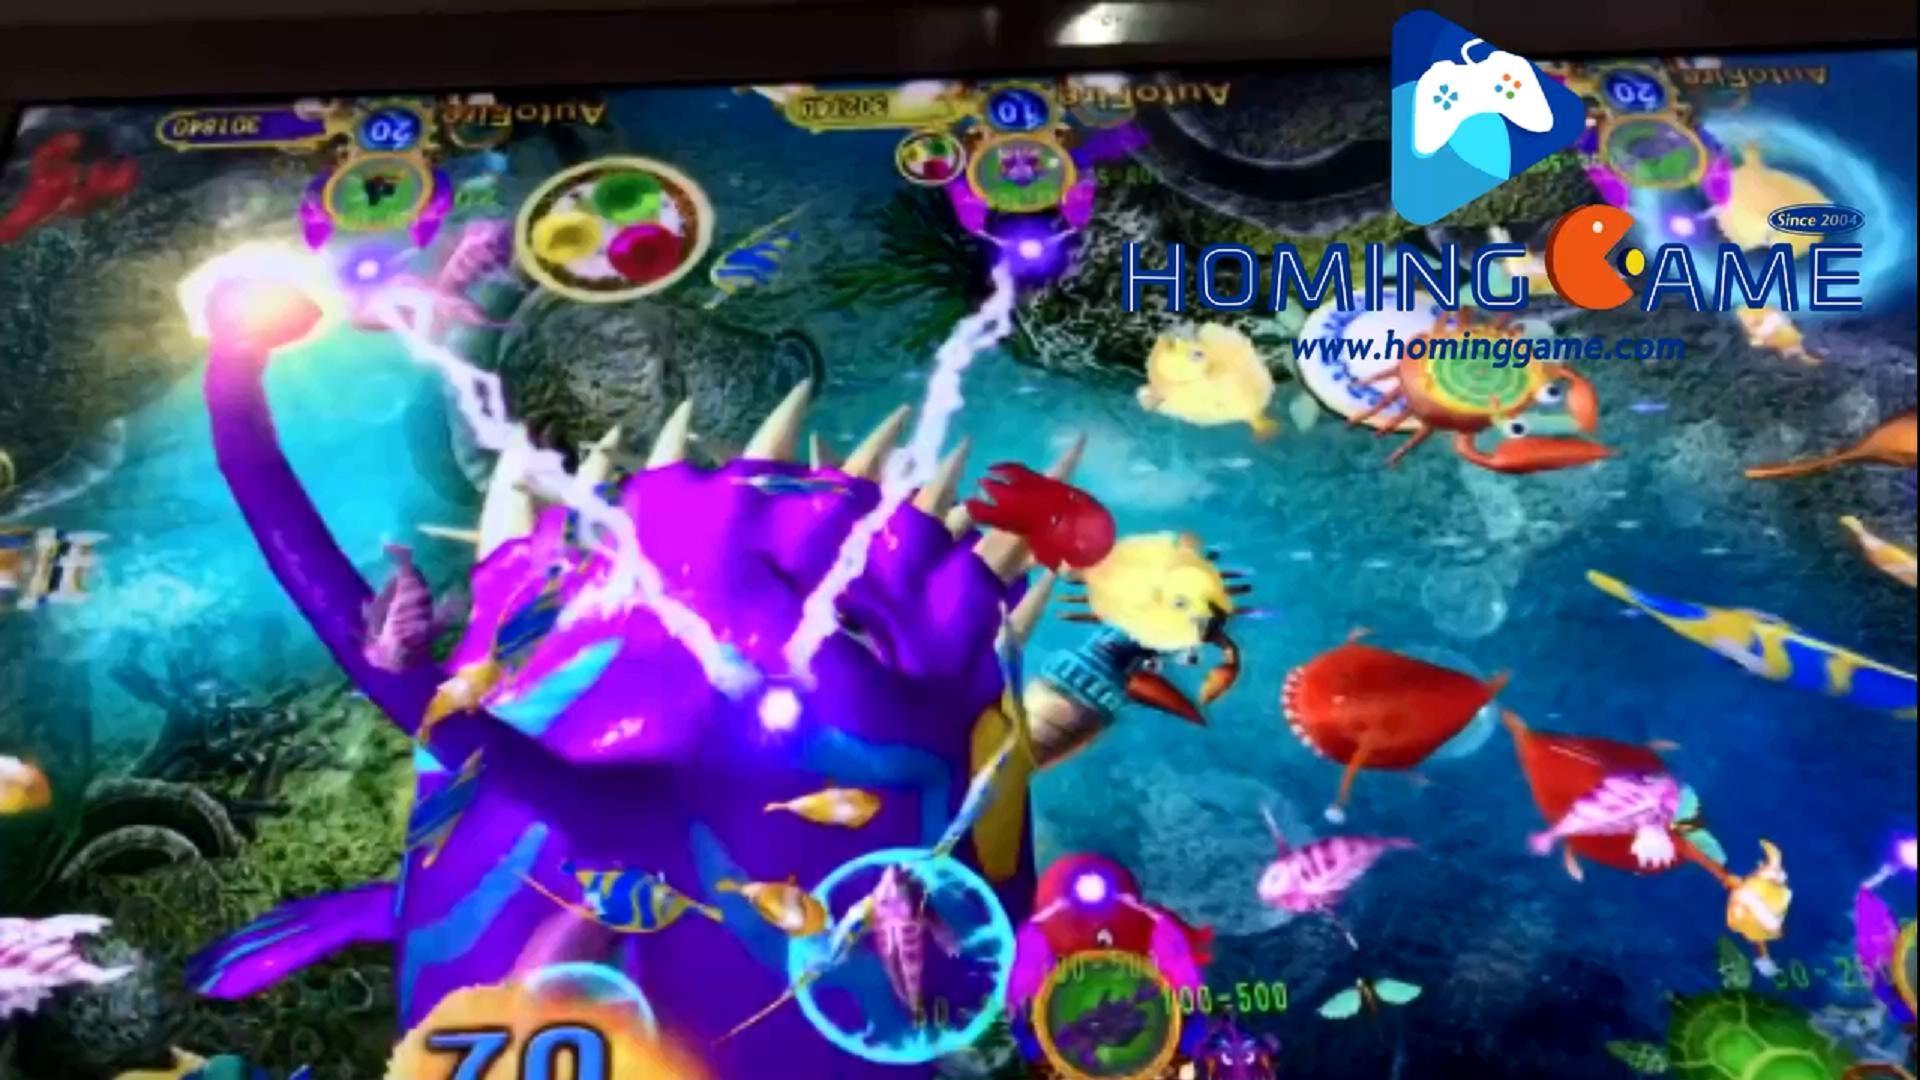 Latest 2019 Ocean King 3 Purple Dragon Legend Revenge Fishing Game Machine By Hominggame Sales Hominggame Com Gametube Fishing Game Kings Game The 3 Kings